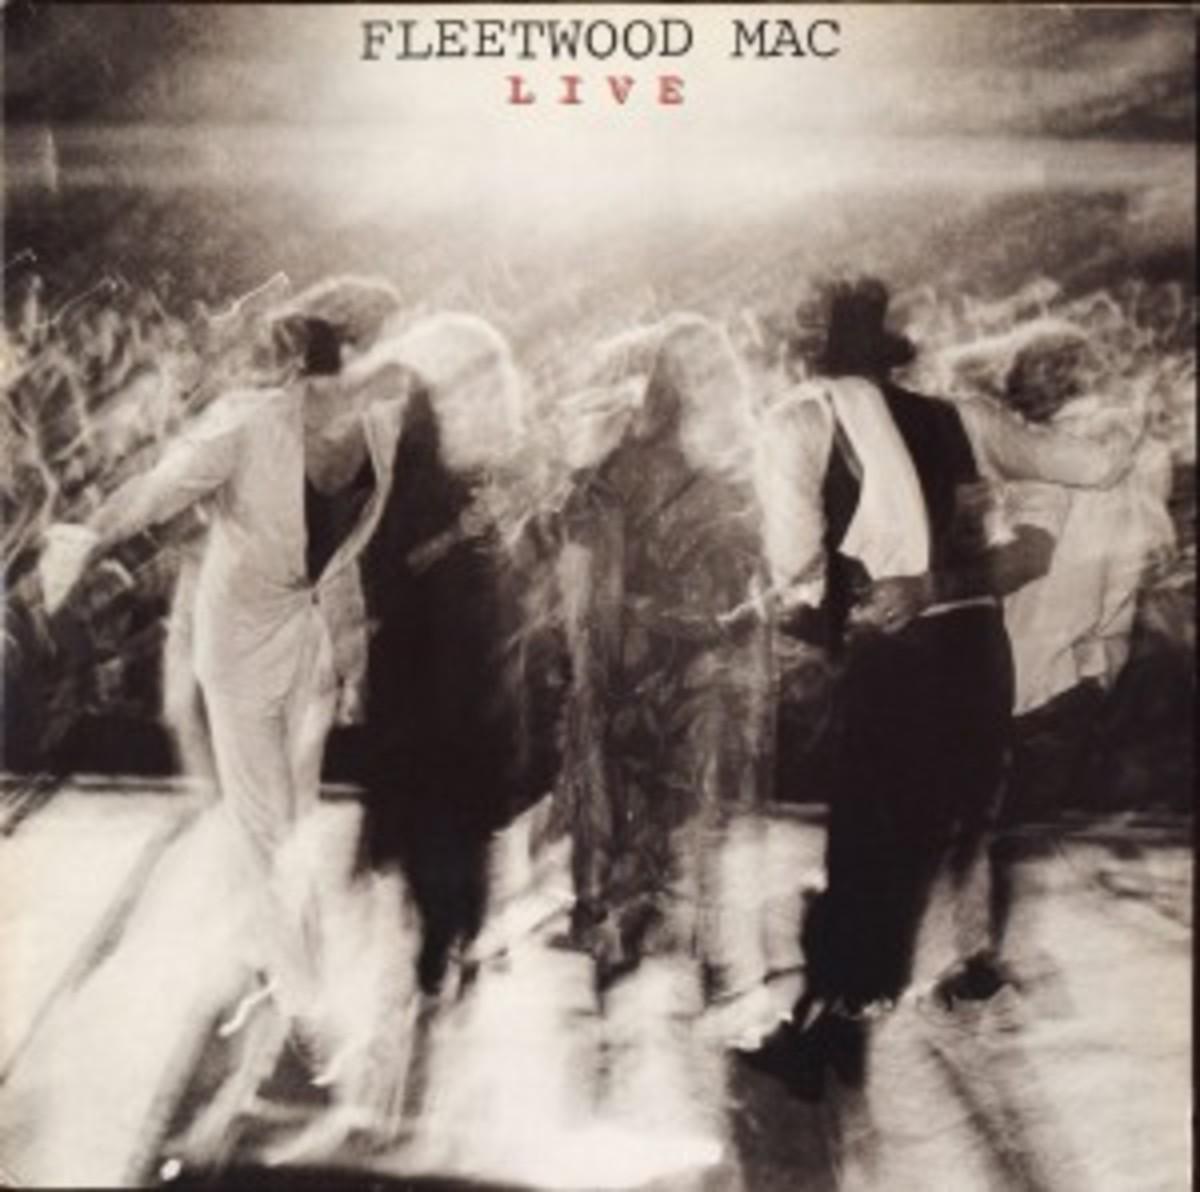 Fleetwood mac_1980_Live